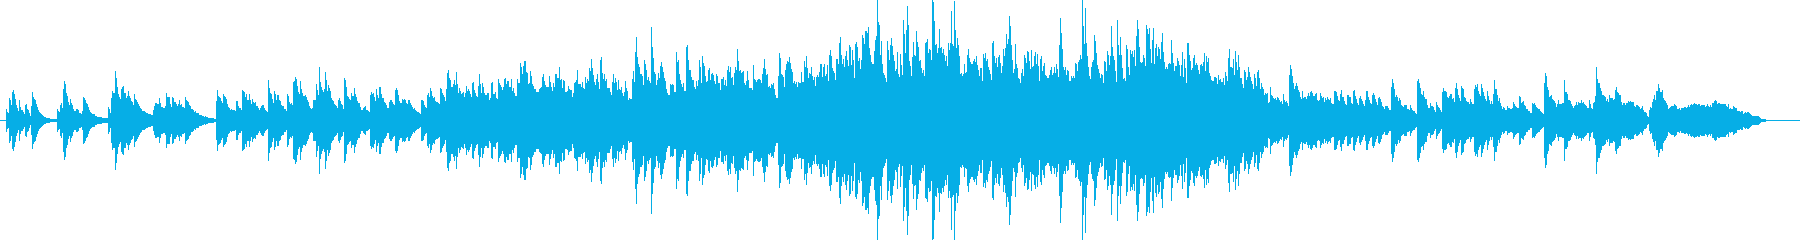 Reminiscence Pianoの再生済みの波形